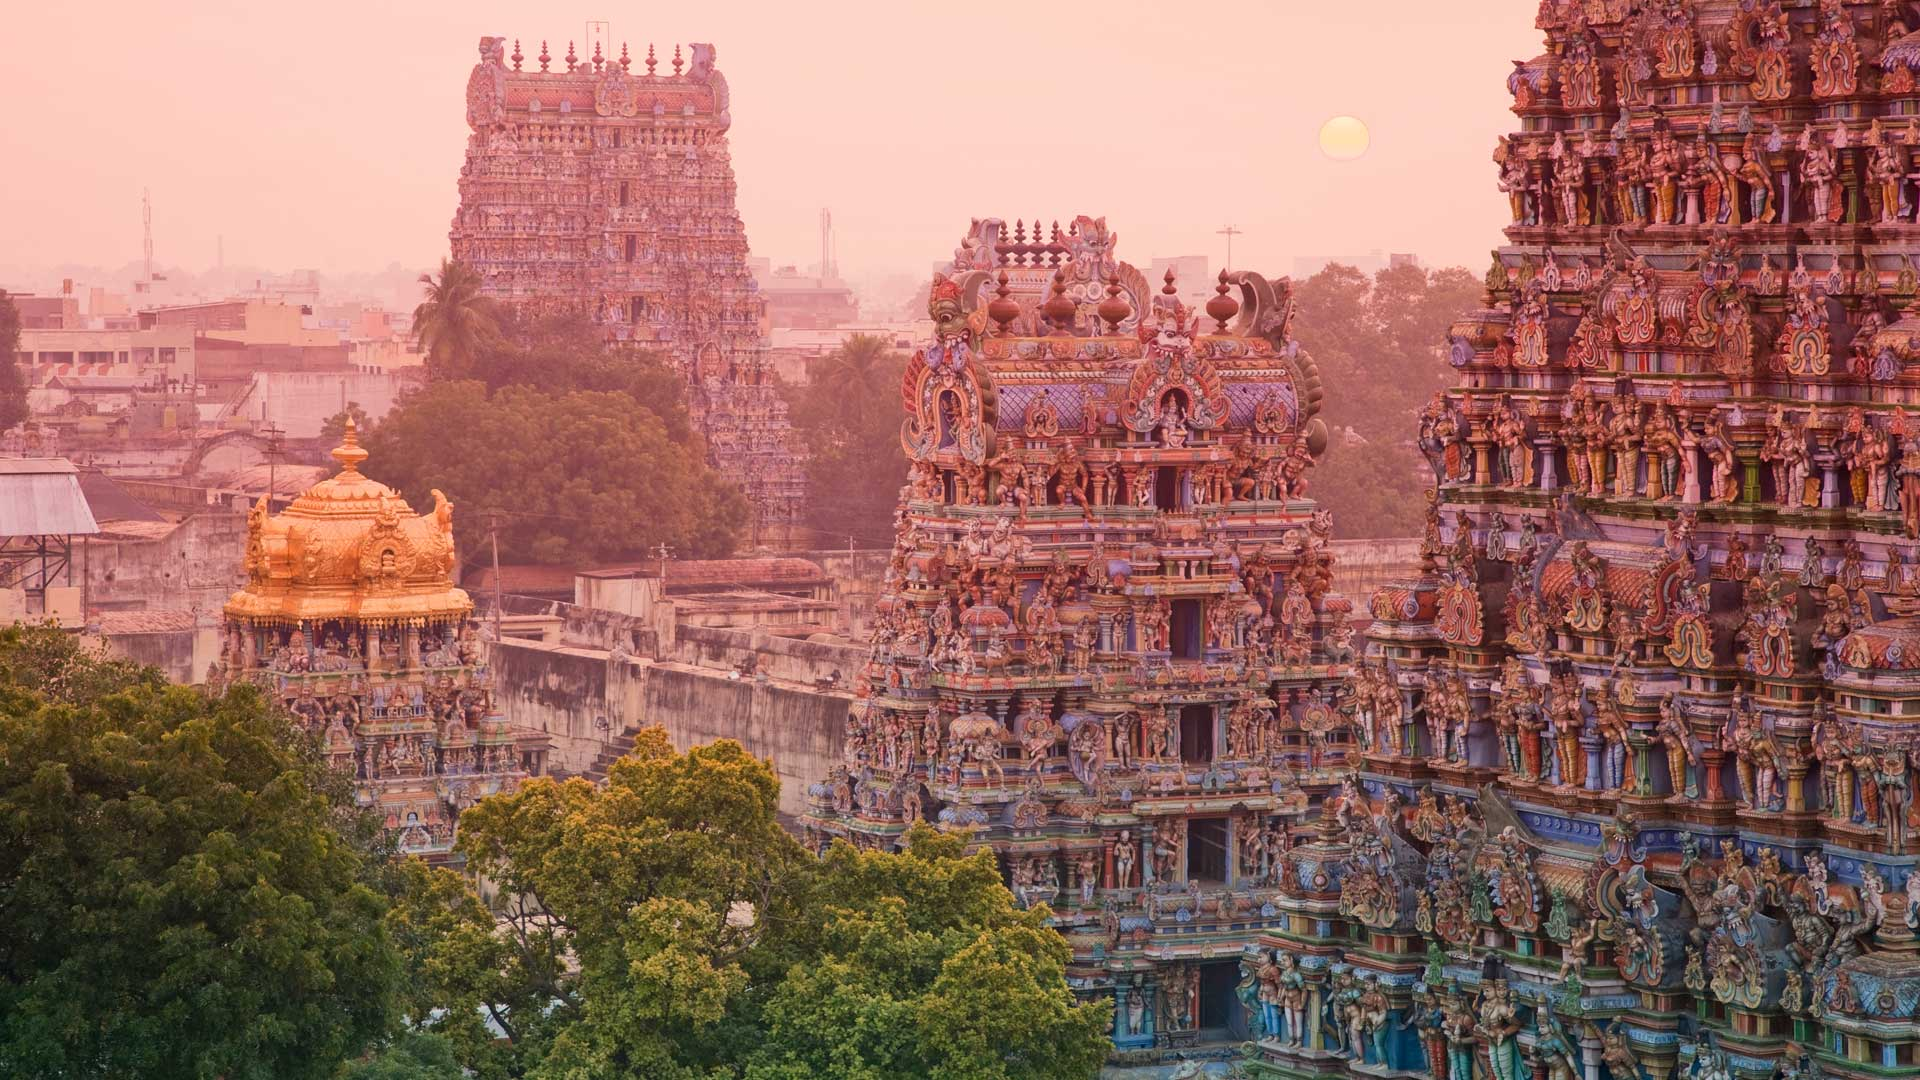 The Sri Meenakshi Temple in Madurai sunset, India with GeoEx